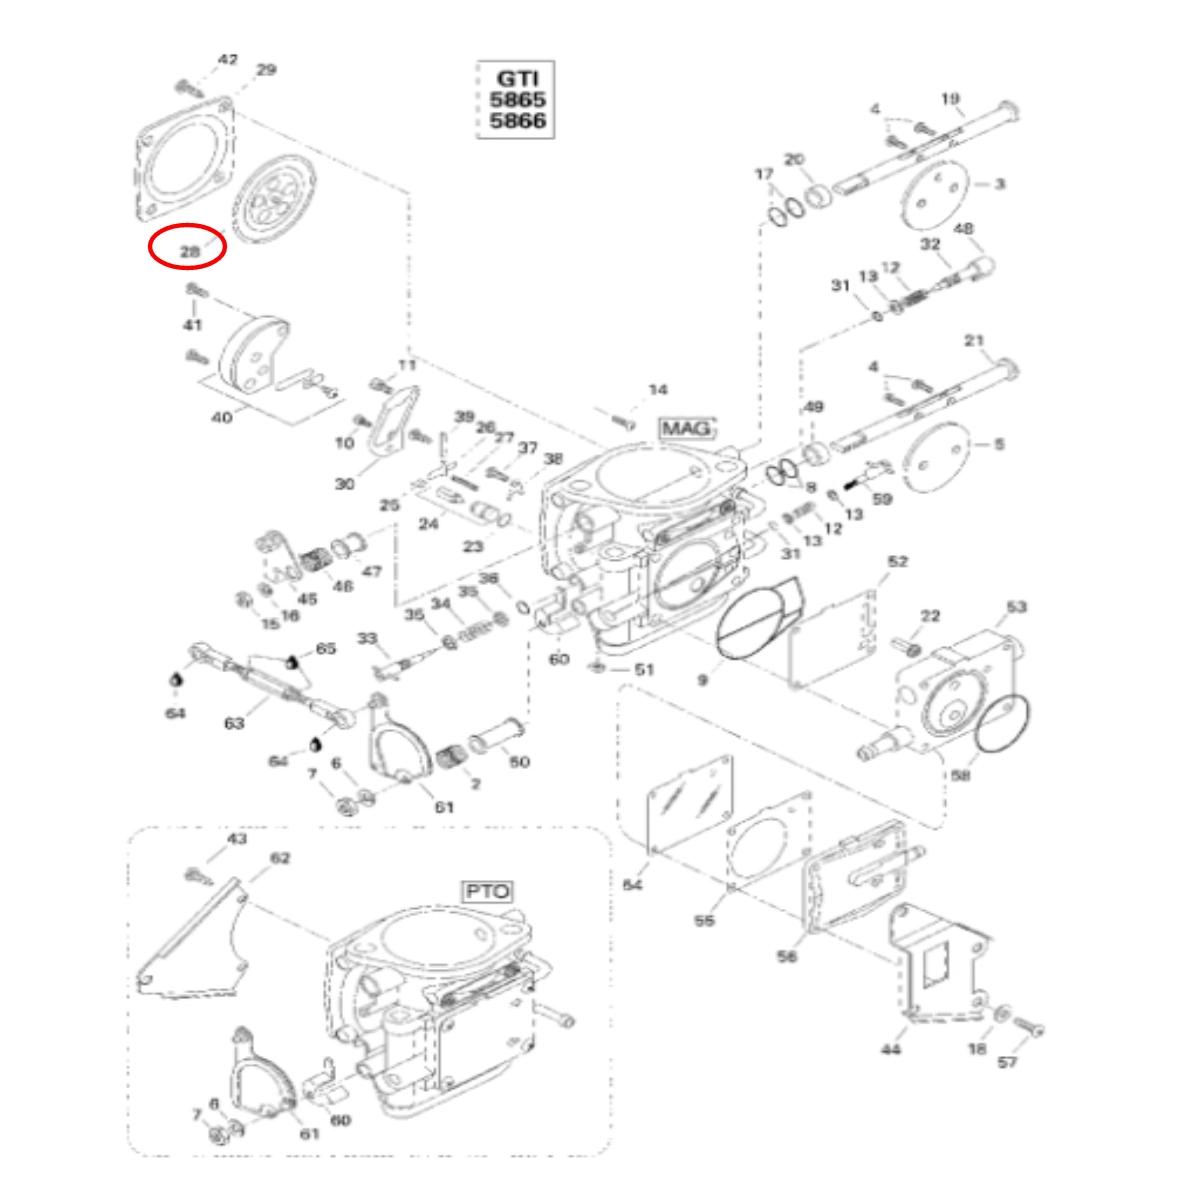 Diafragma Para Jet Ski Sea Doo e Yamaha Mikuni  MK-10-001  - Radical Peças - Peças para Jet Ski